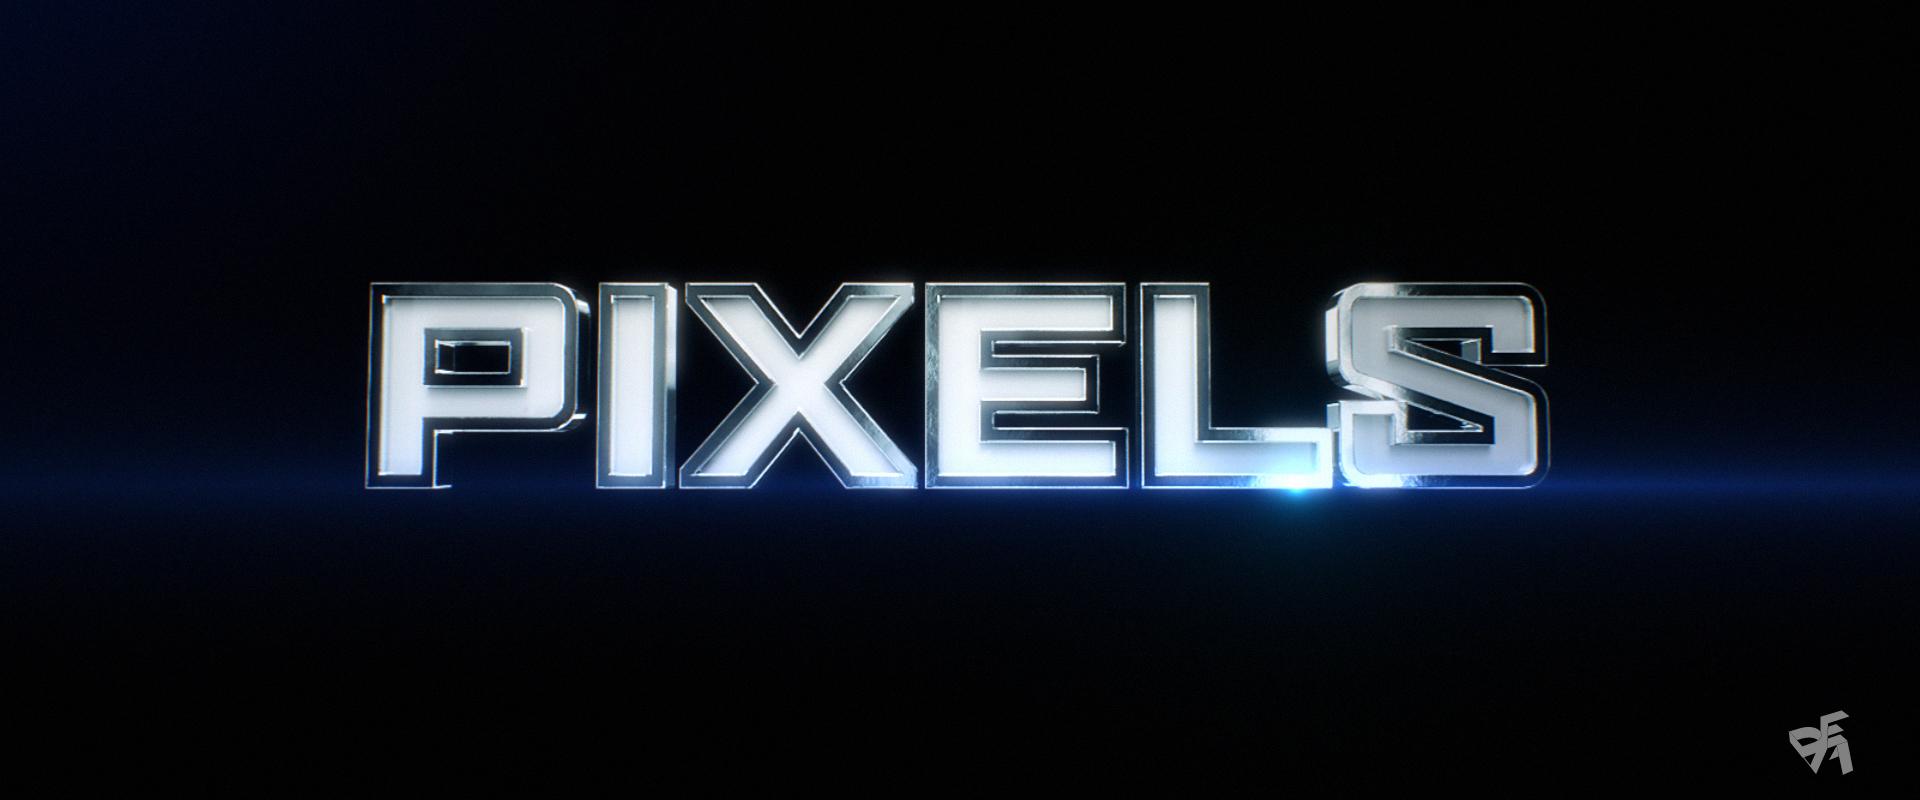 Pixels-STYLEFRAME_05.jpg